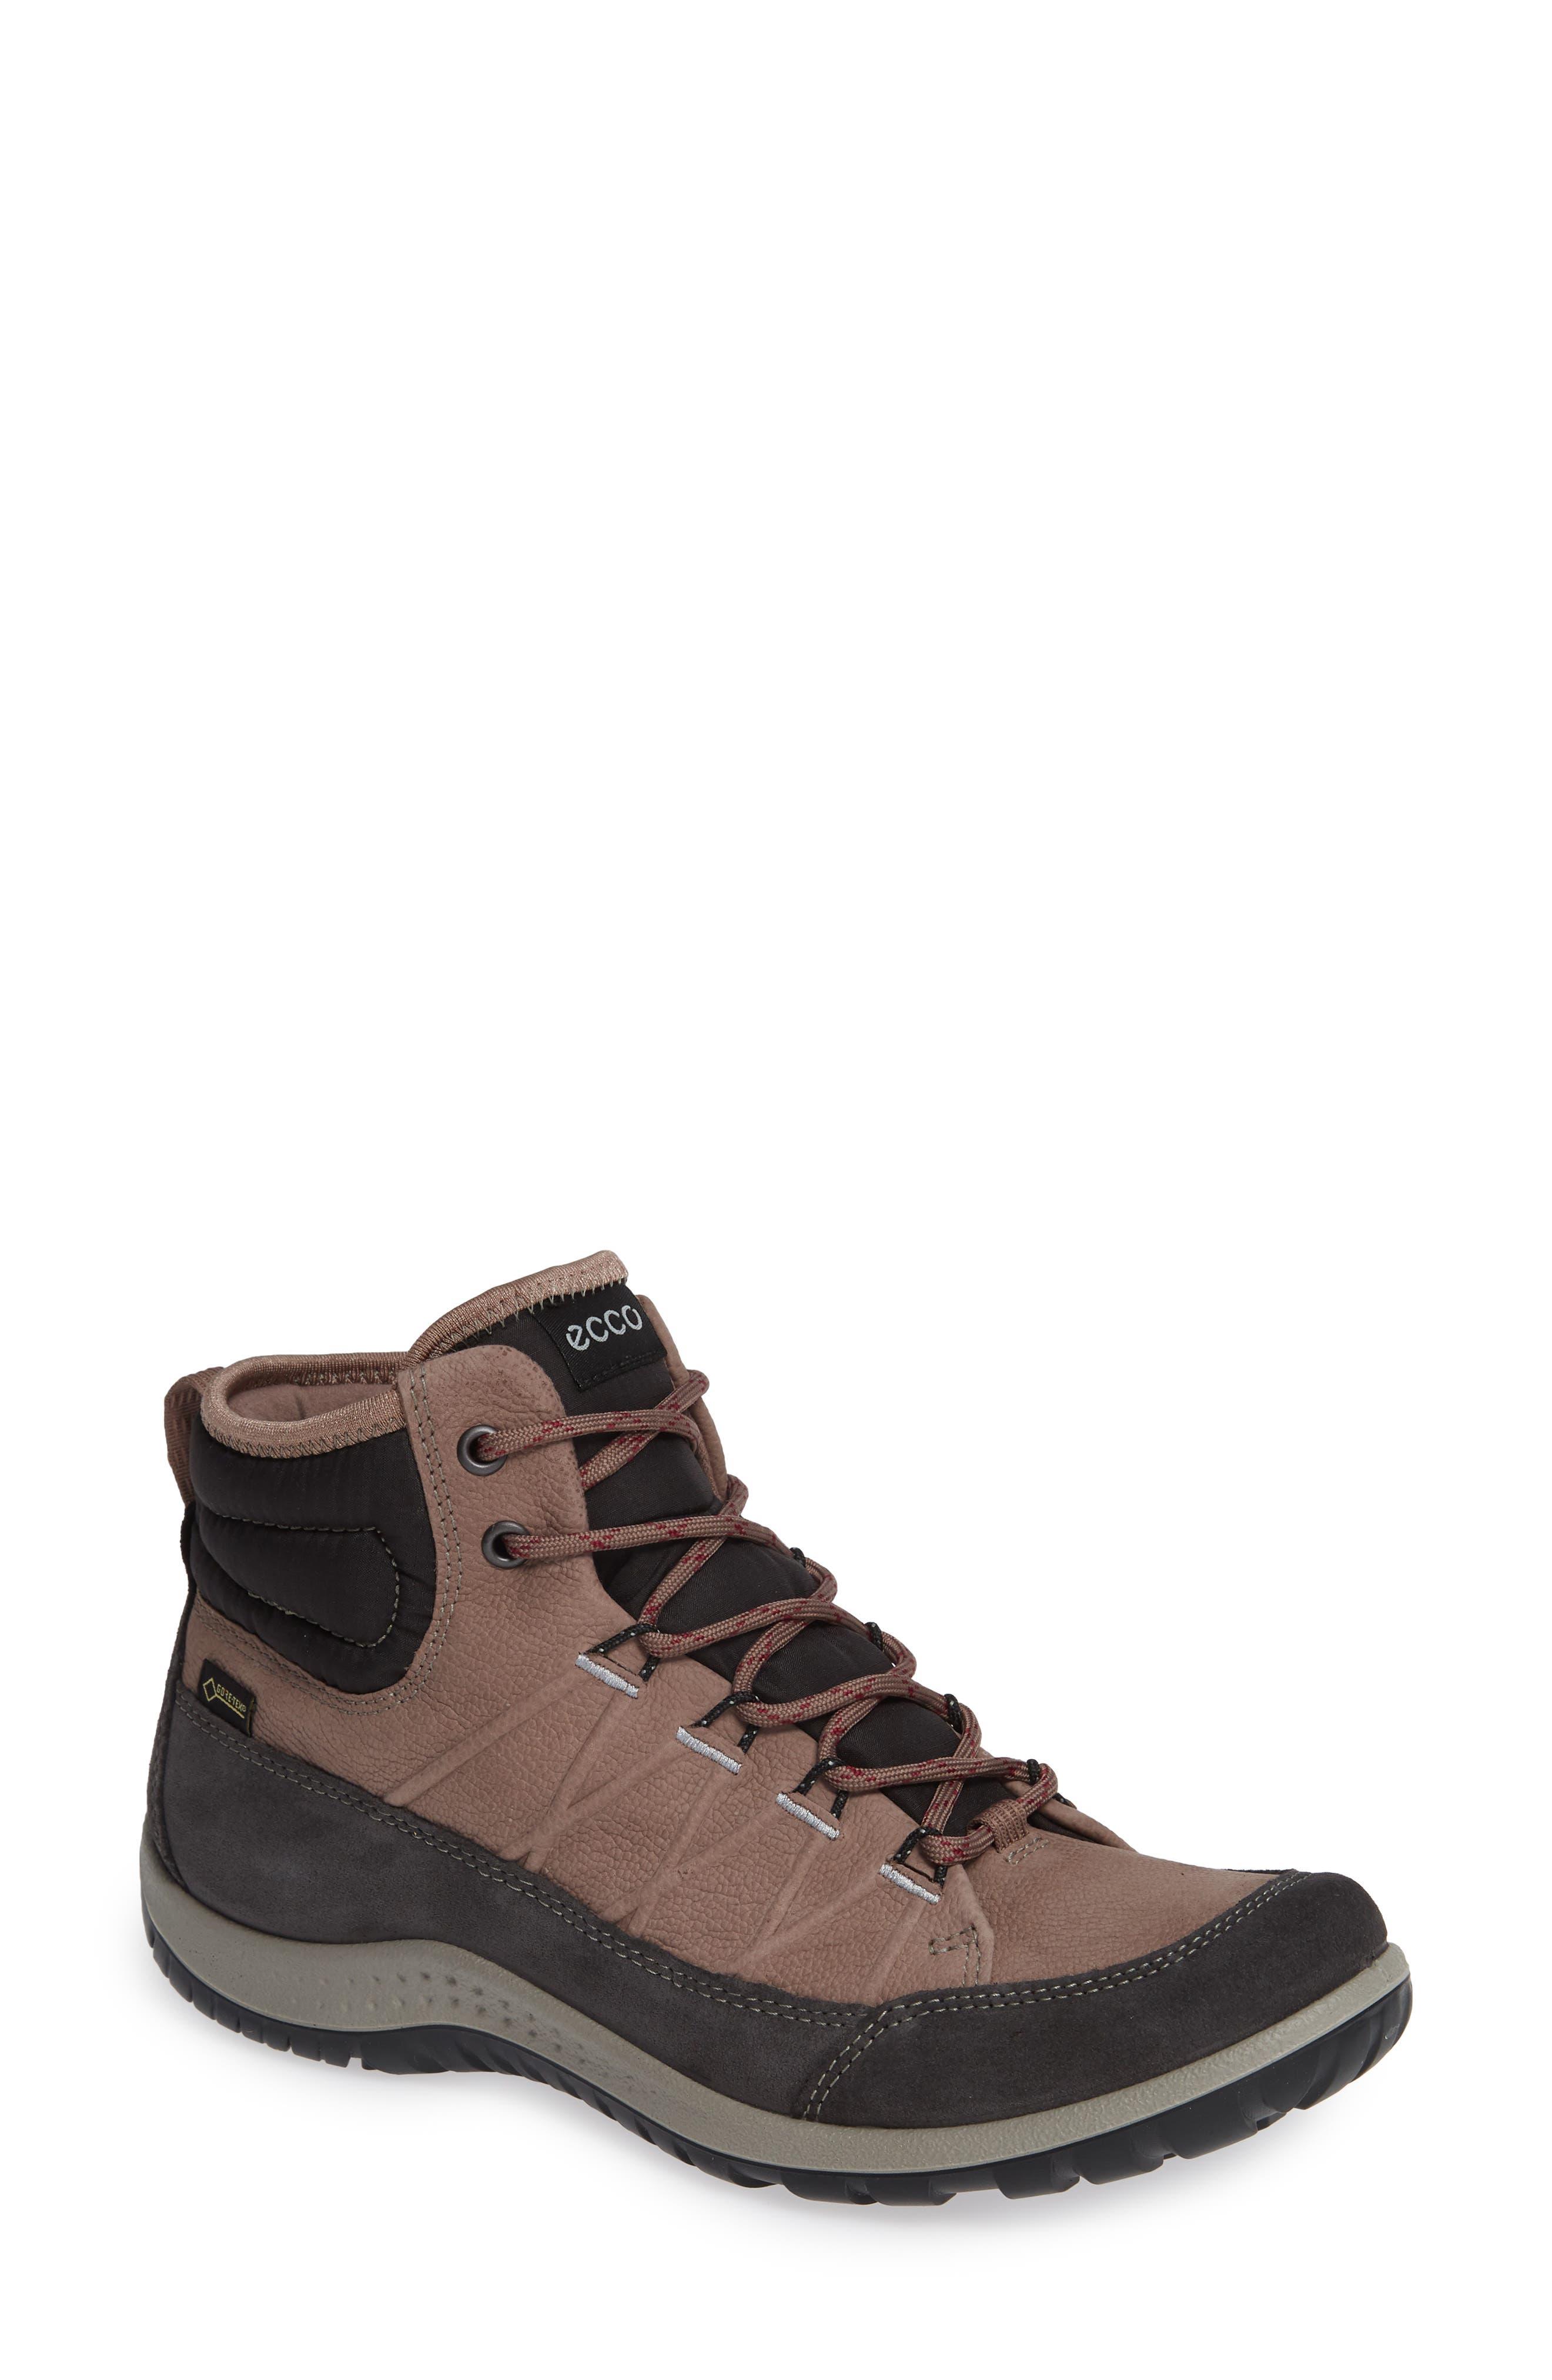 ECCO 'Aspina GTX' Waterproof High Top Shoe, Main, color, DEEP TAUPE NUBUCK LEATHER